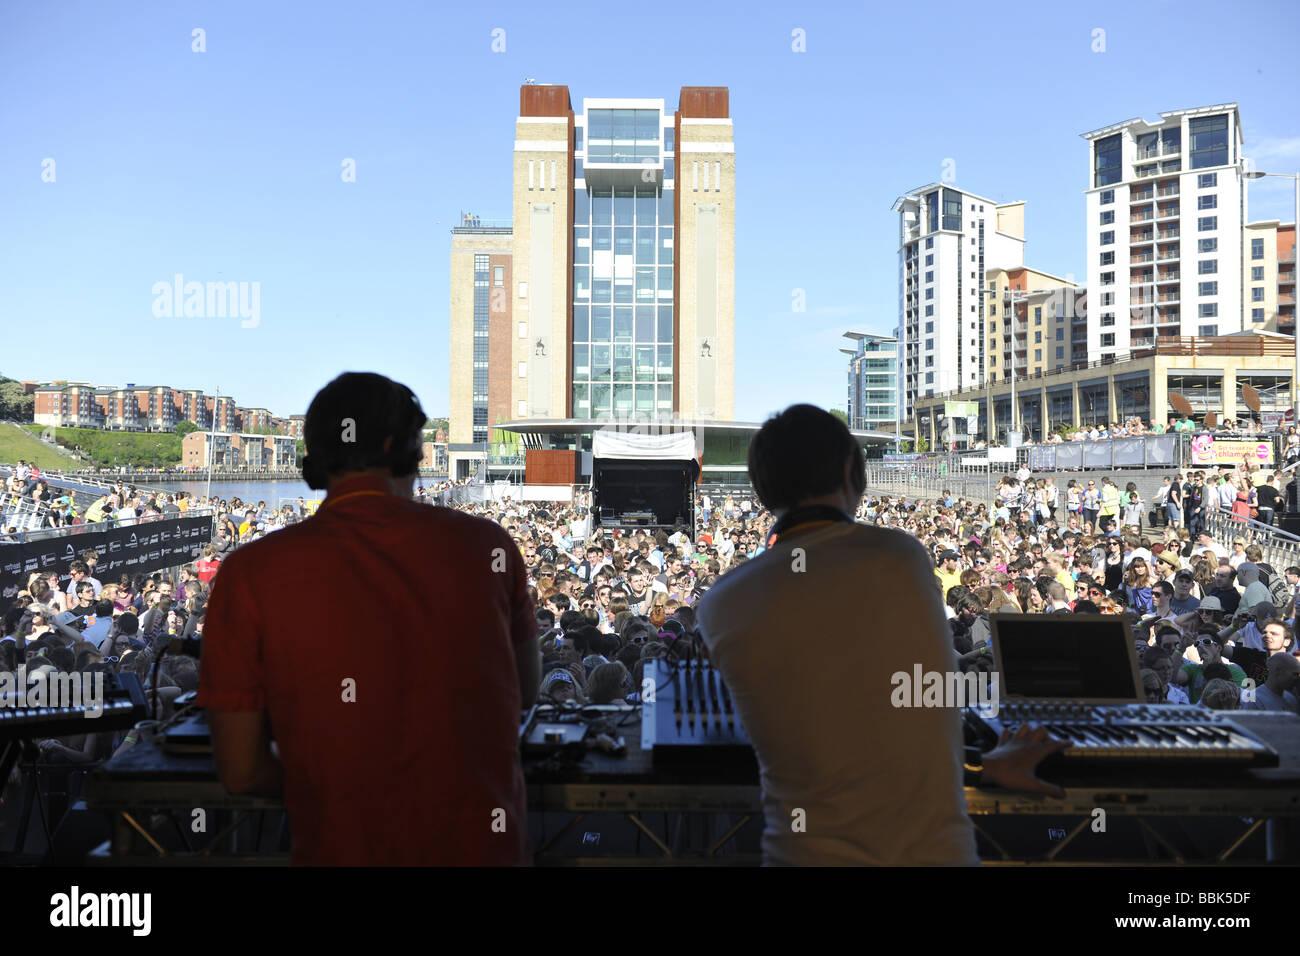 DJs Playing at Evolution Festival - Stock Image